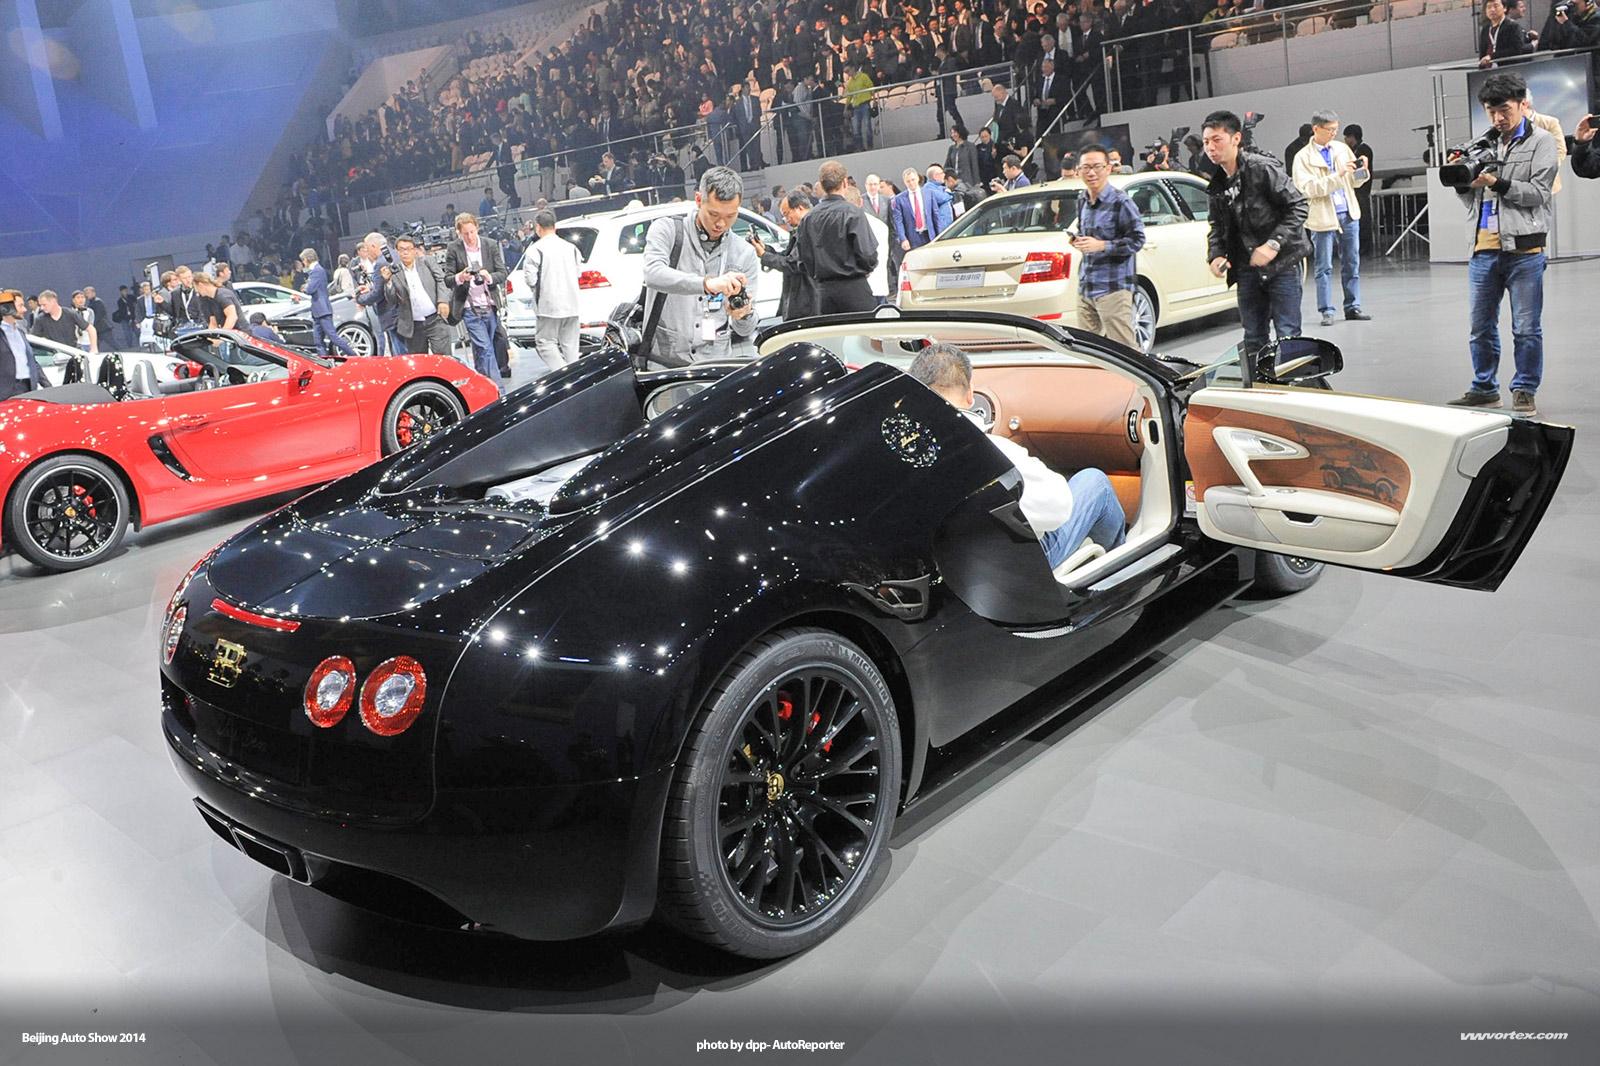 beijing-auto-show-2014-bugatti-363